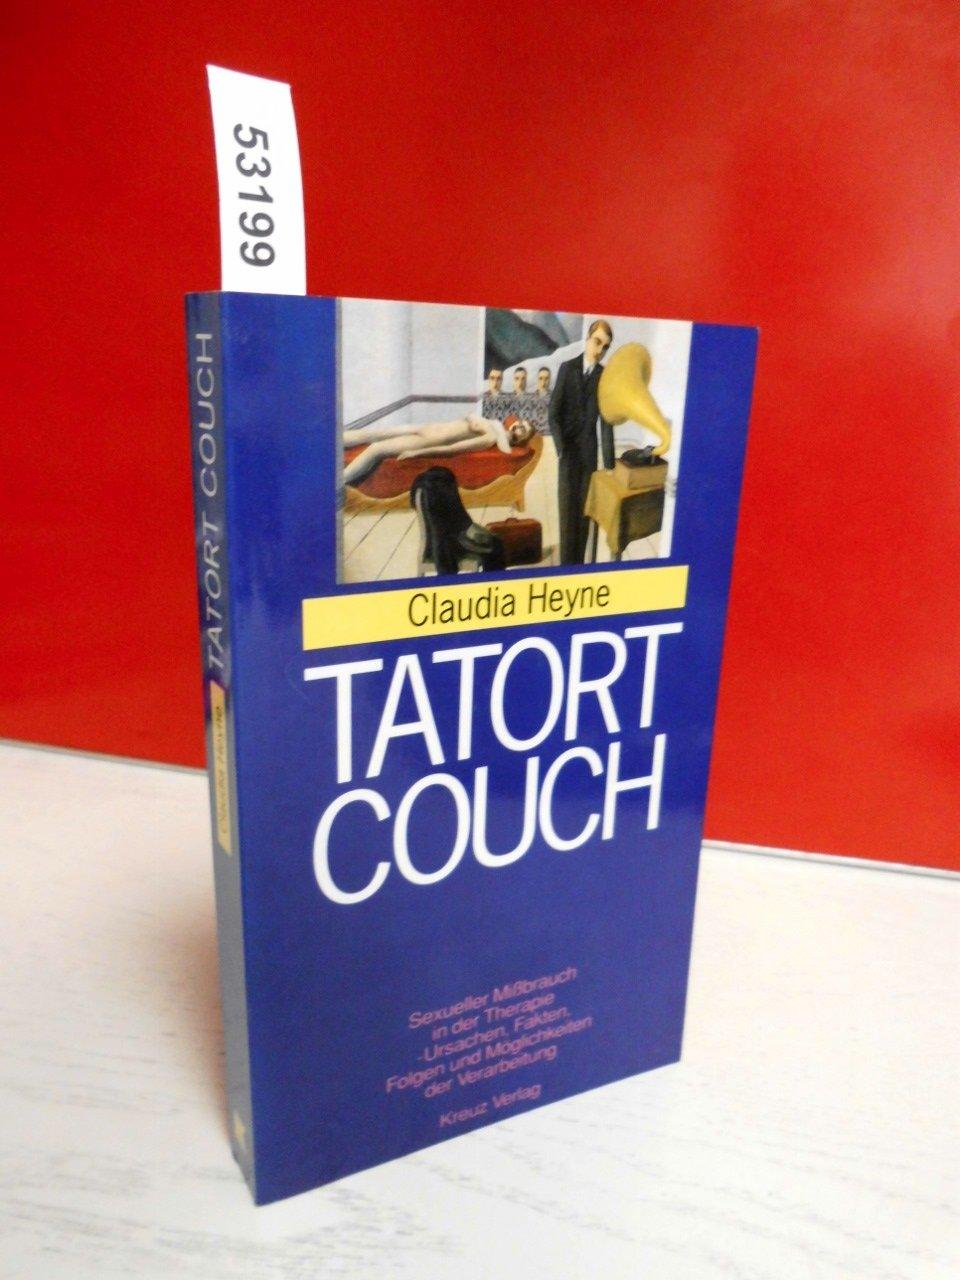 Tatort Couch